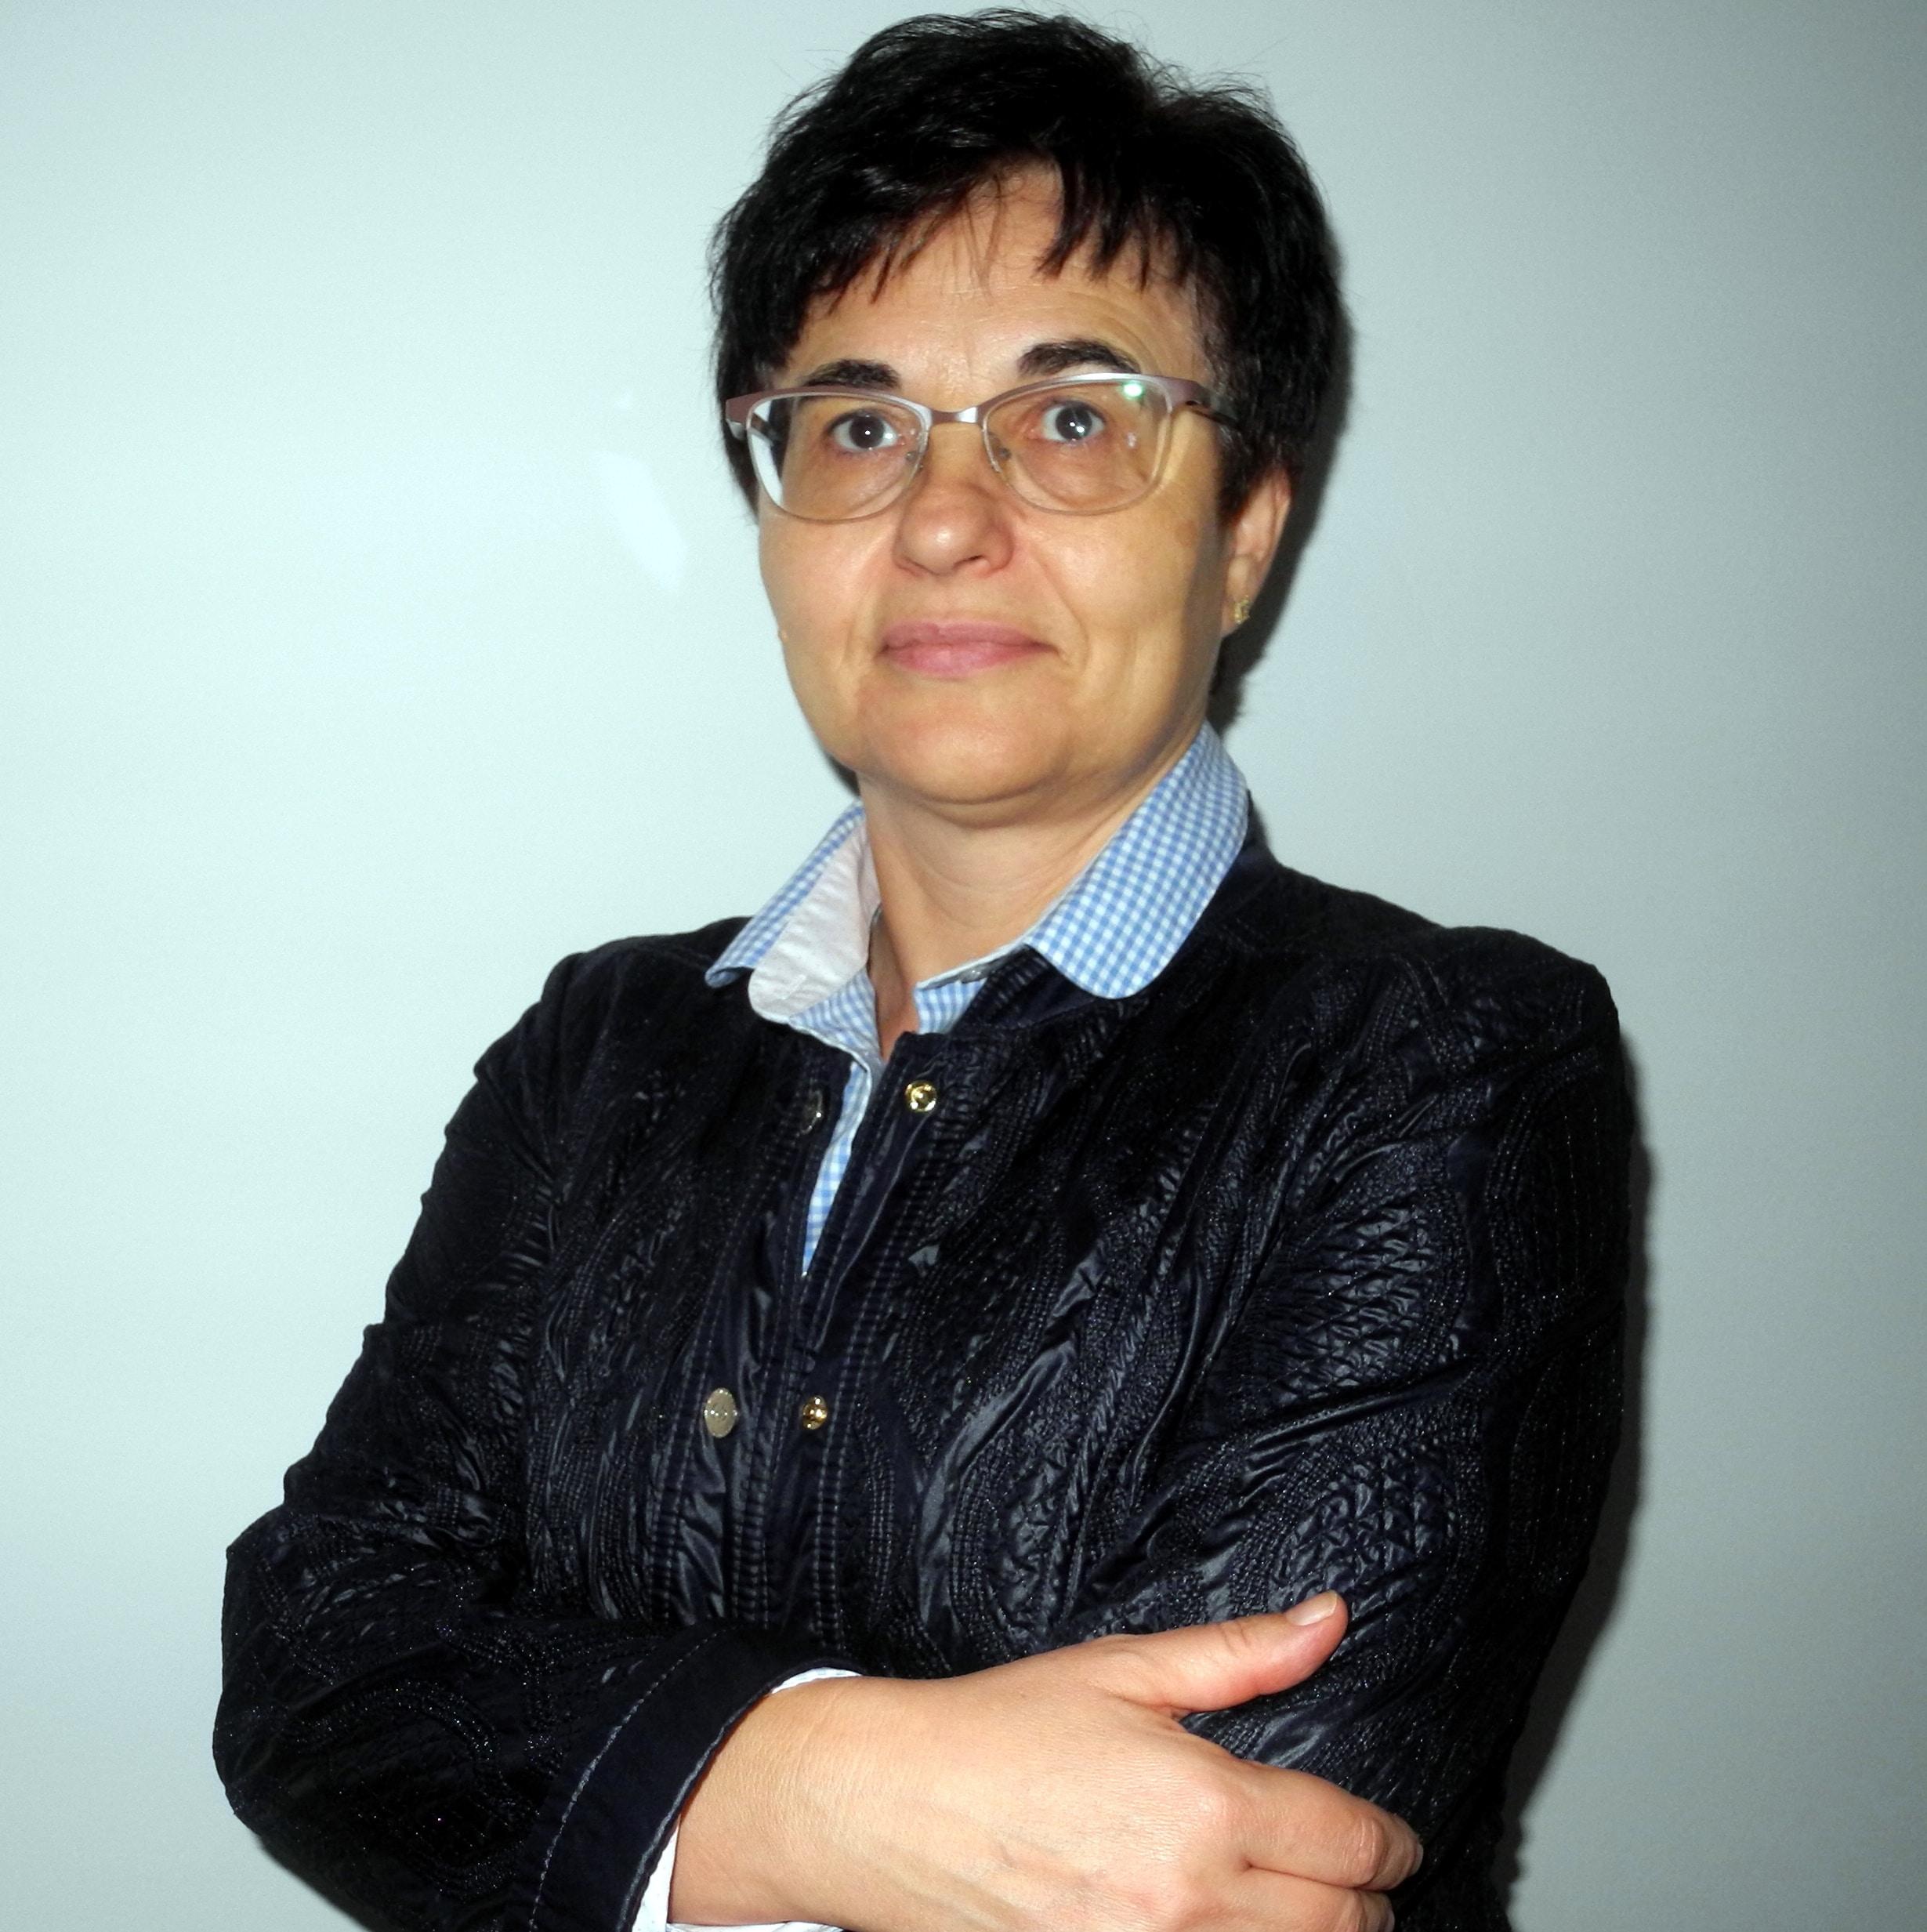 uni.dipl. pravnica Jasna Cepić, NLP Mojster, NLP Praktik Coach